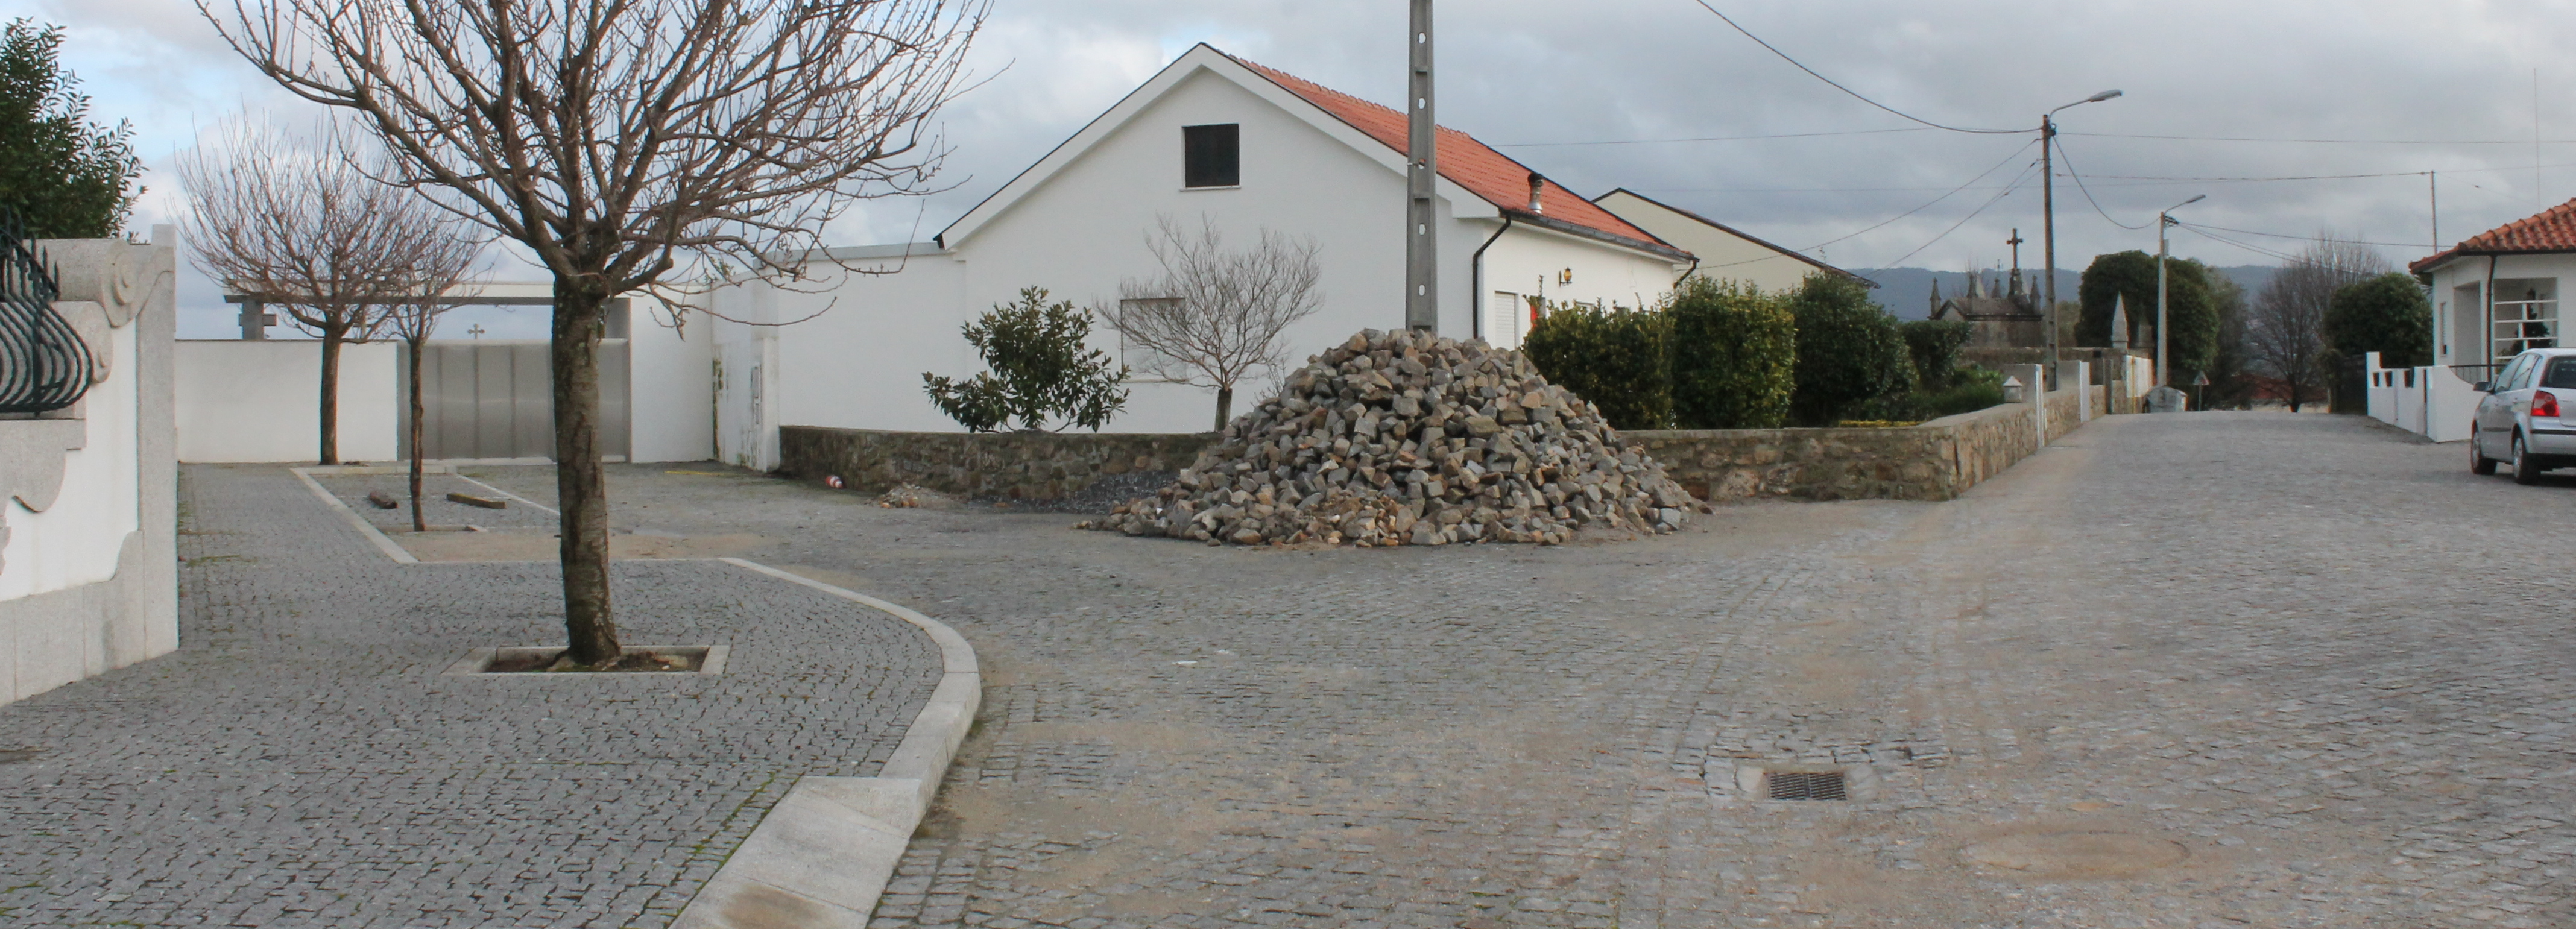 Junta de Arcozelo requalifica Rua da Igreja